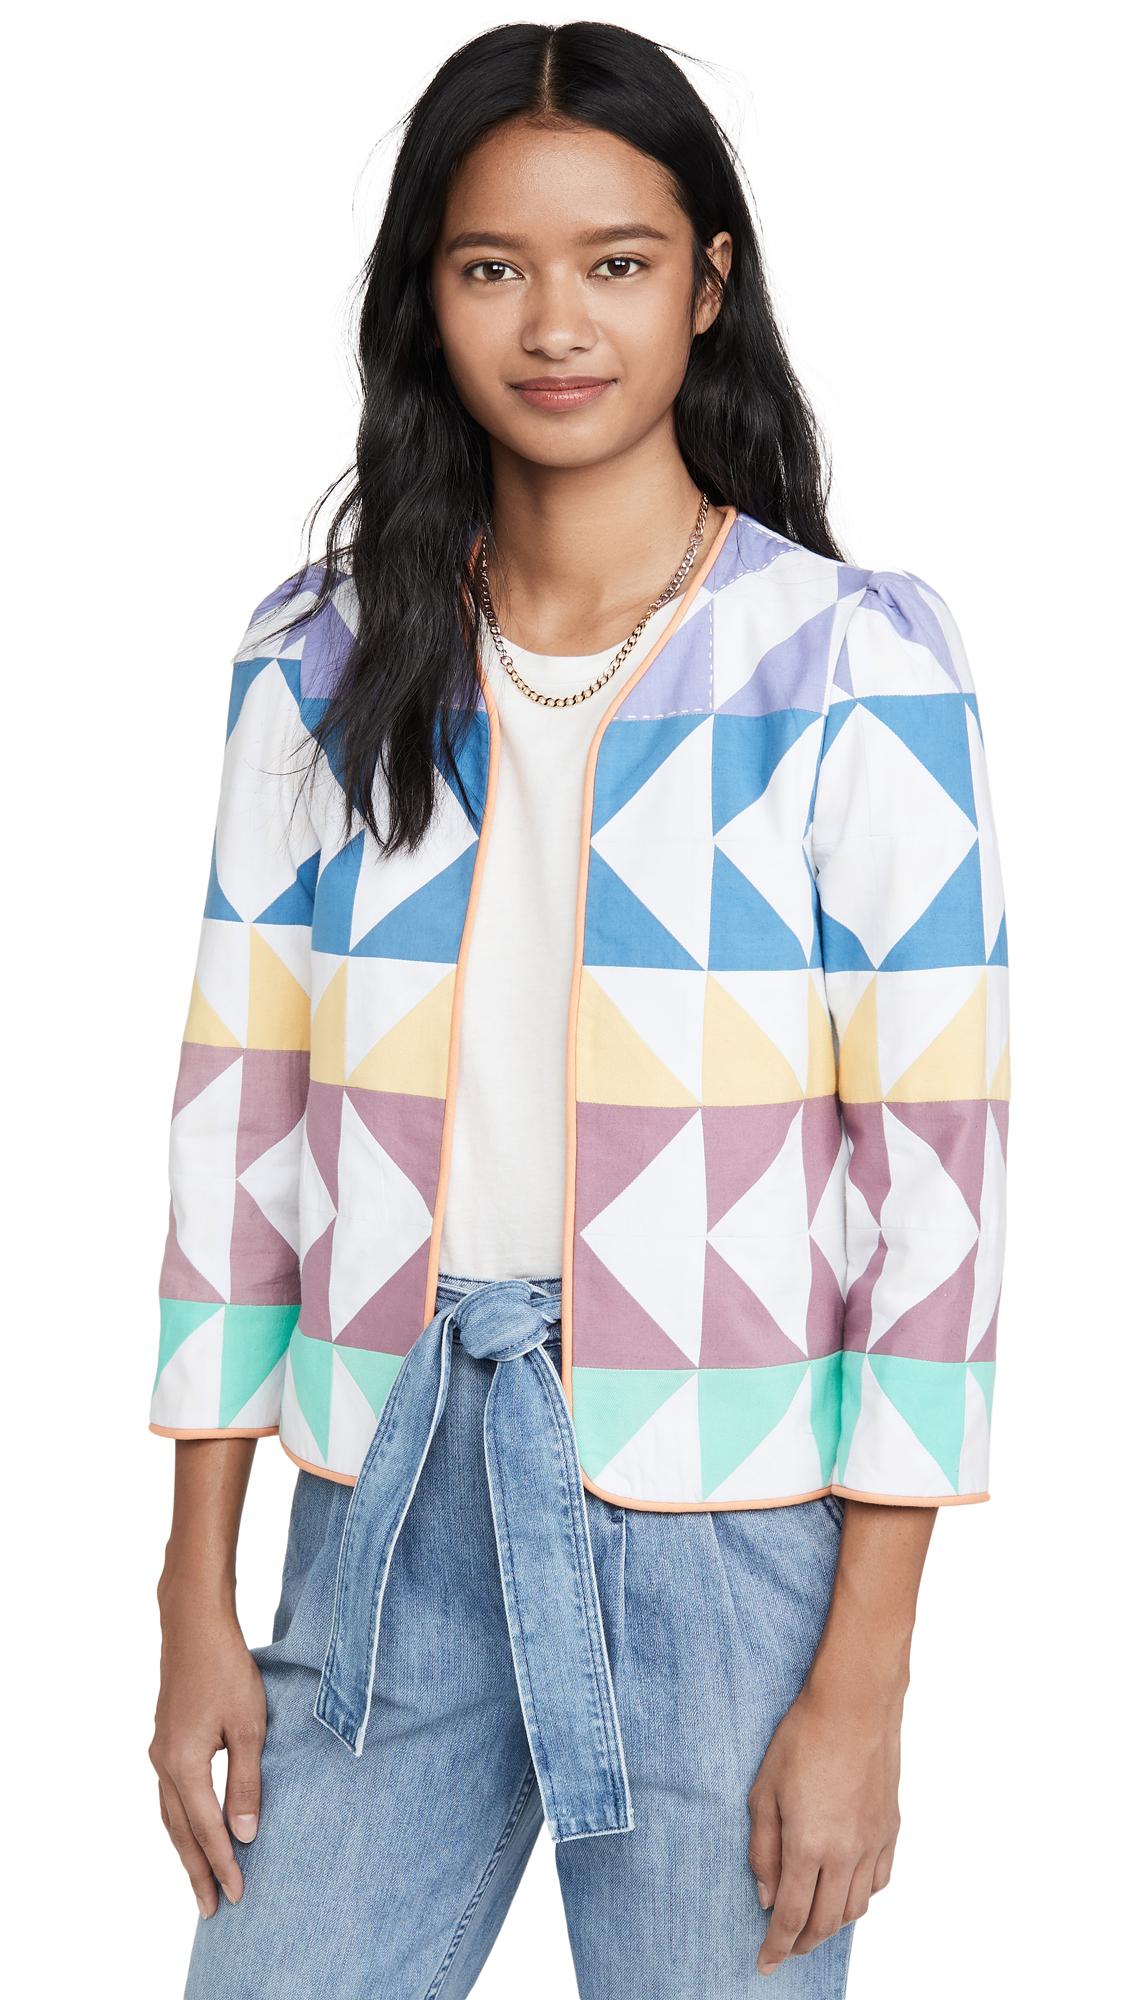 Buy Alix of Bohemia Tropicana Quilt Jacket online beautiful Alix of Bohemia Jackets, Coats, Coats